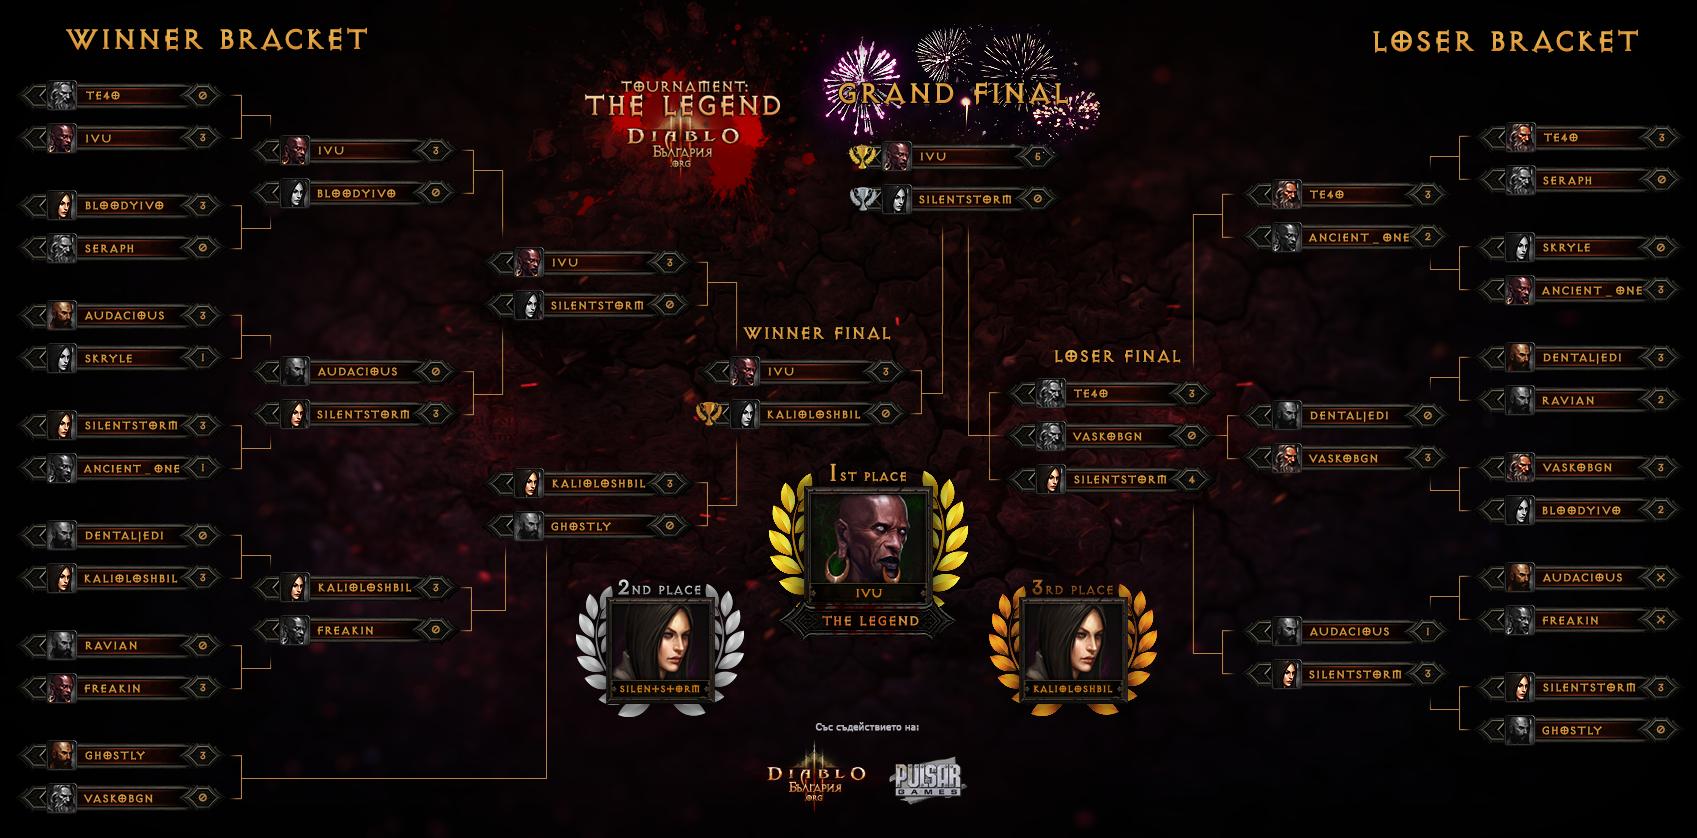 Tournament: The Legend